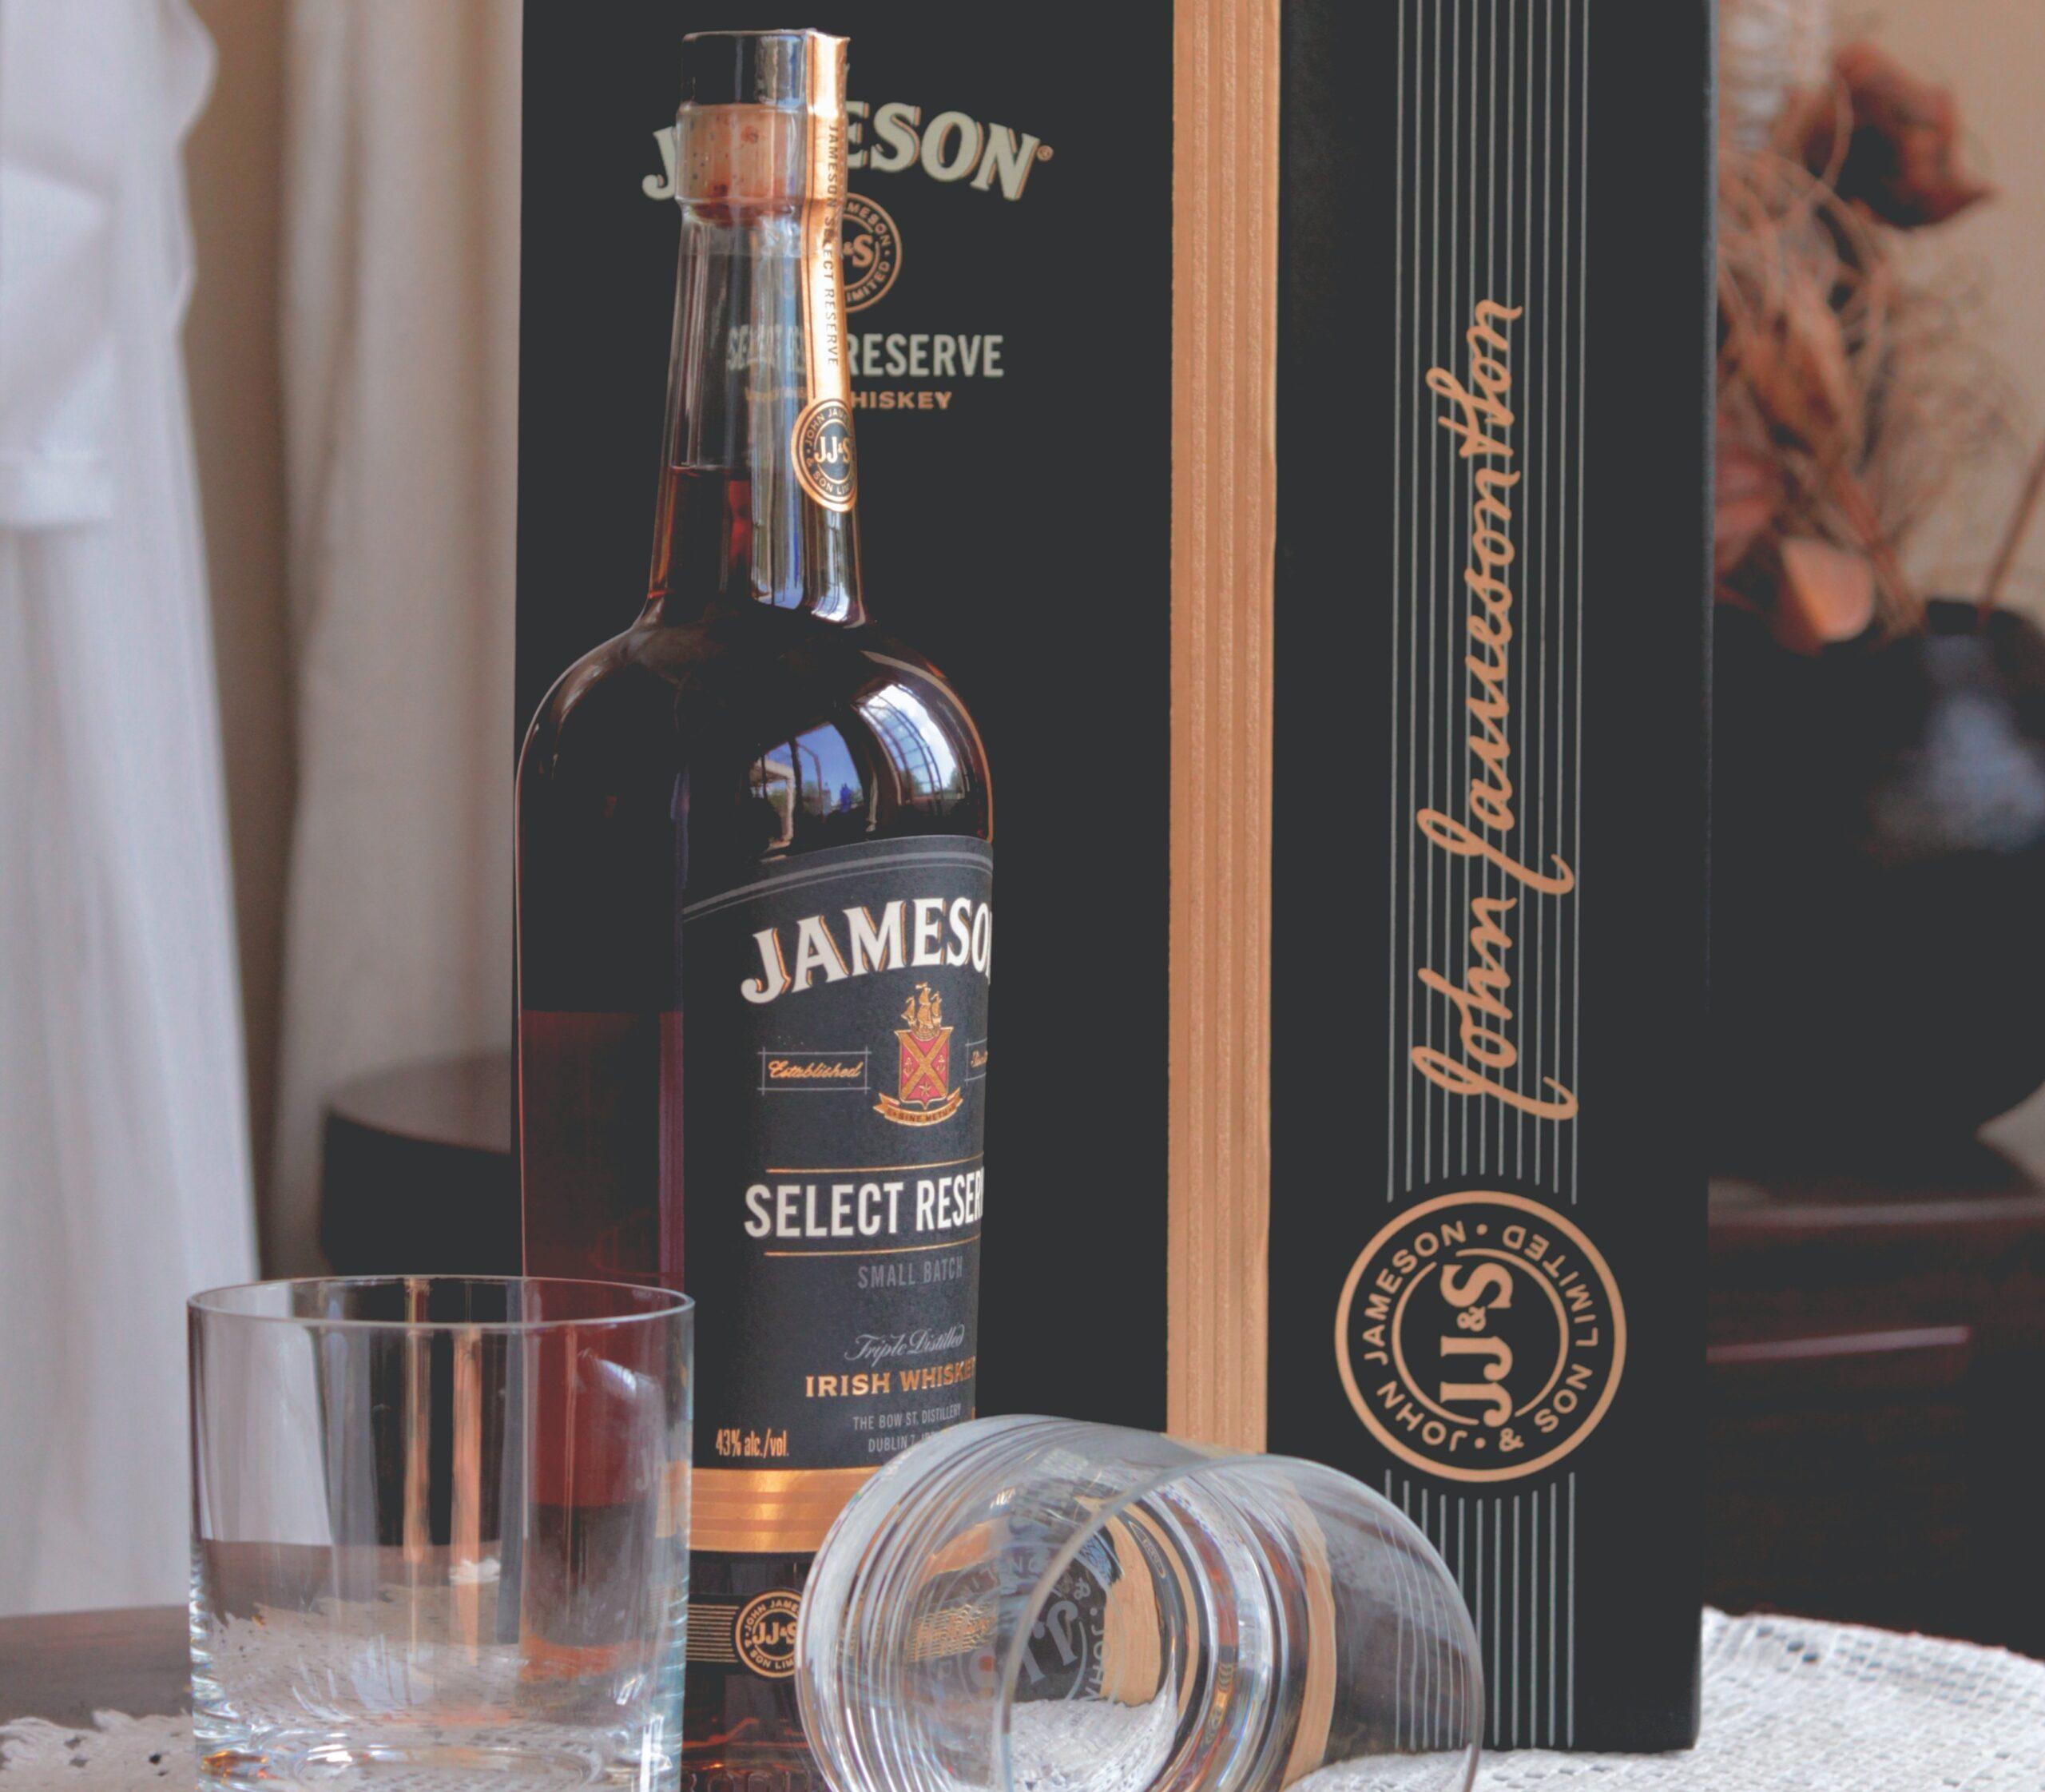 Flasche Jamesons